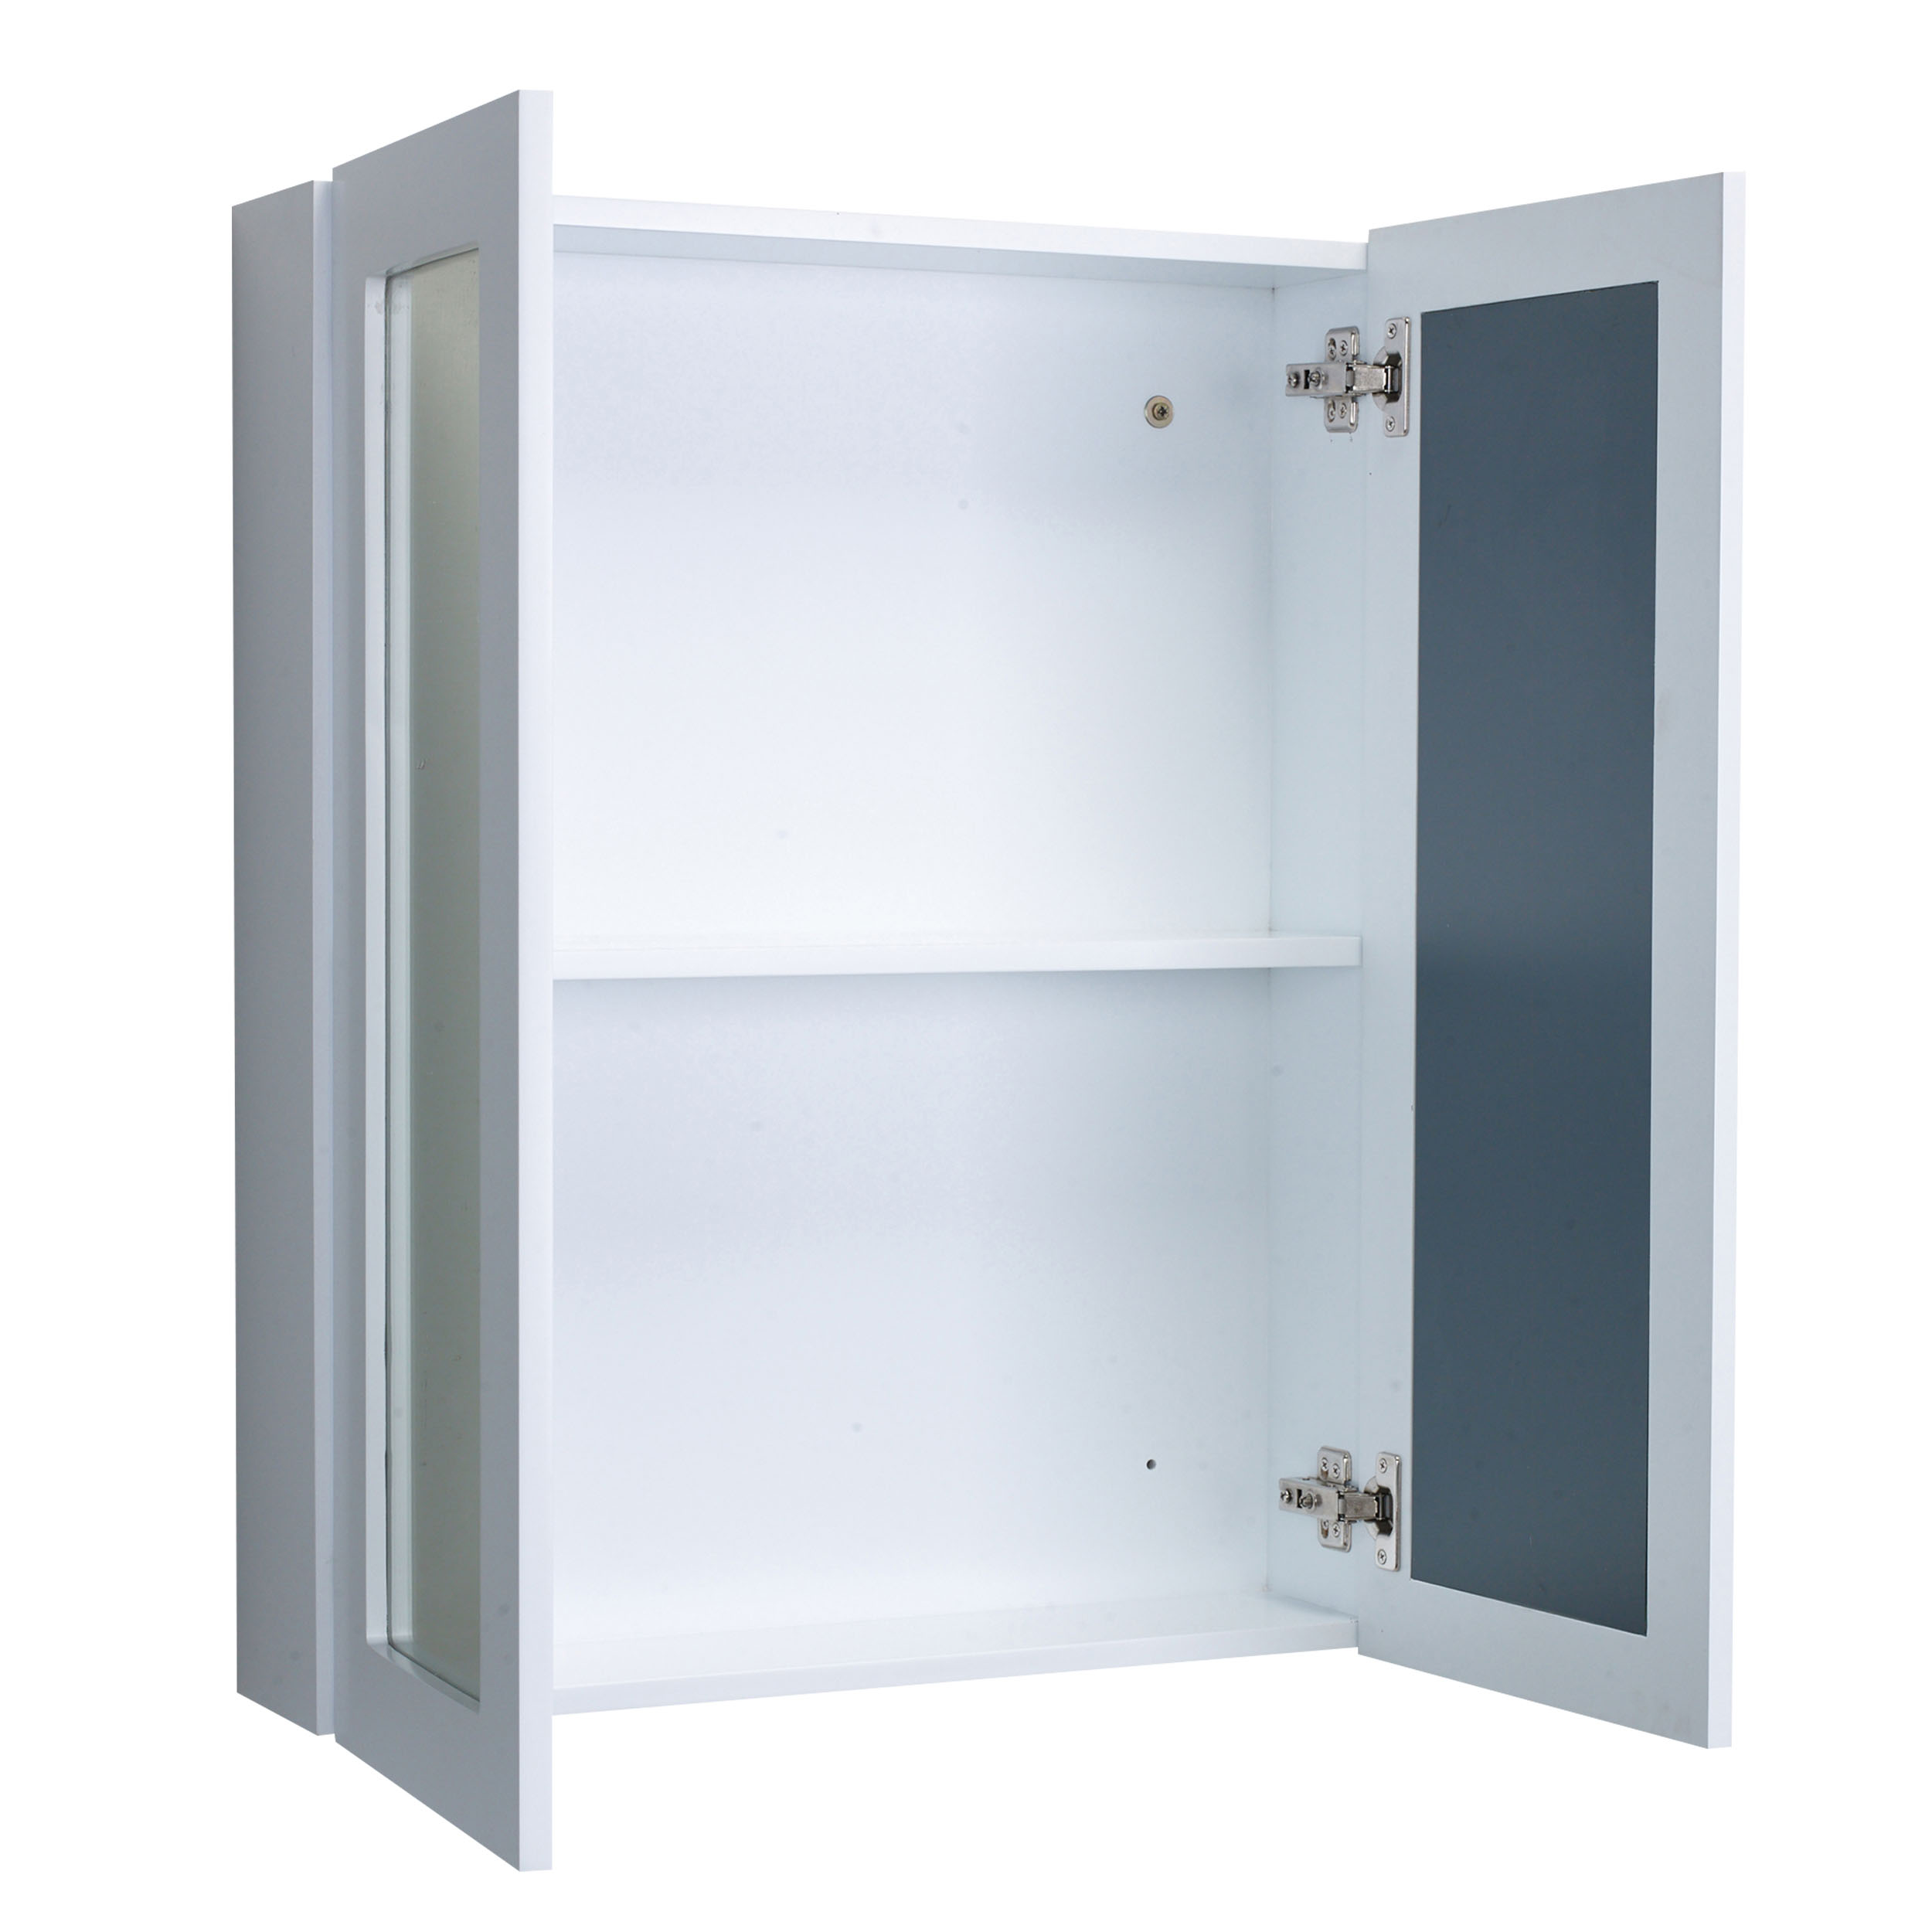 Eviva Tux 24 Inch White Wall Mount Medicine Cabinet | Decors US